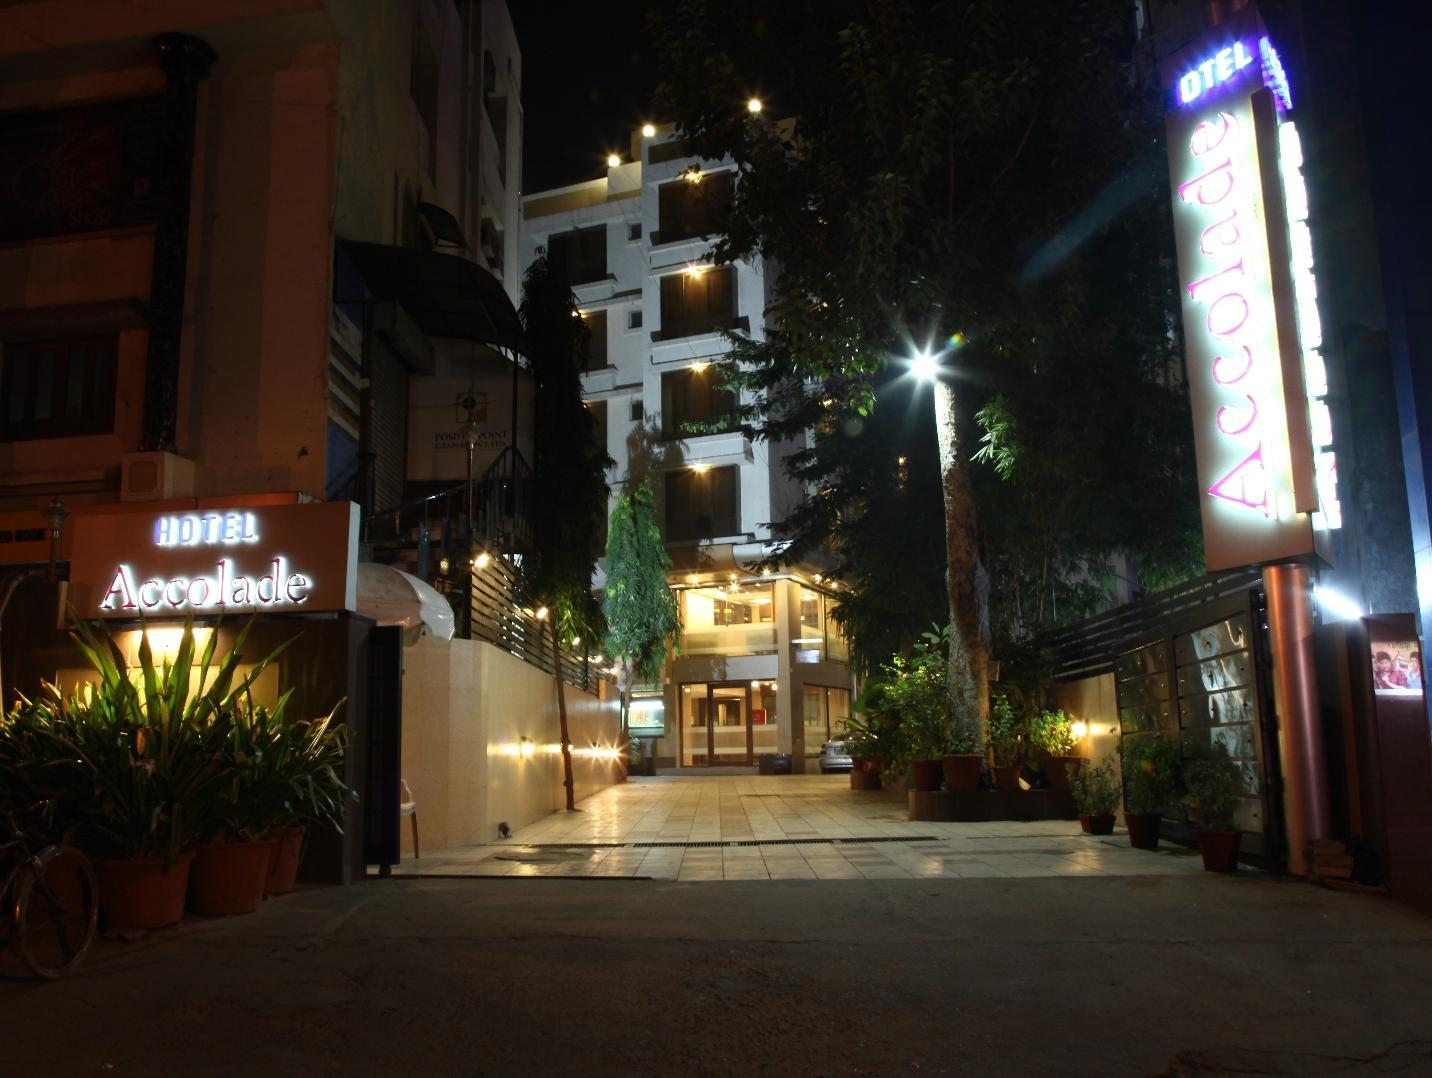 Hotel Accolade - Ahmedabad